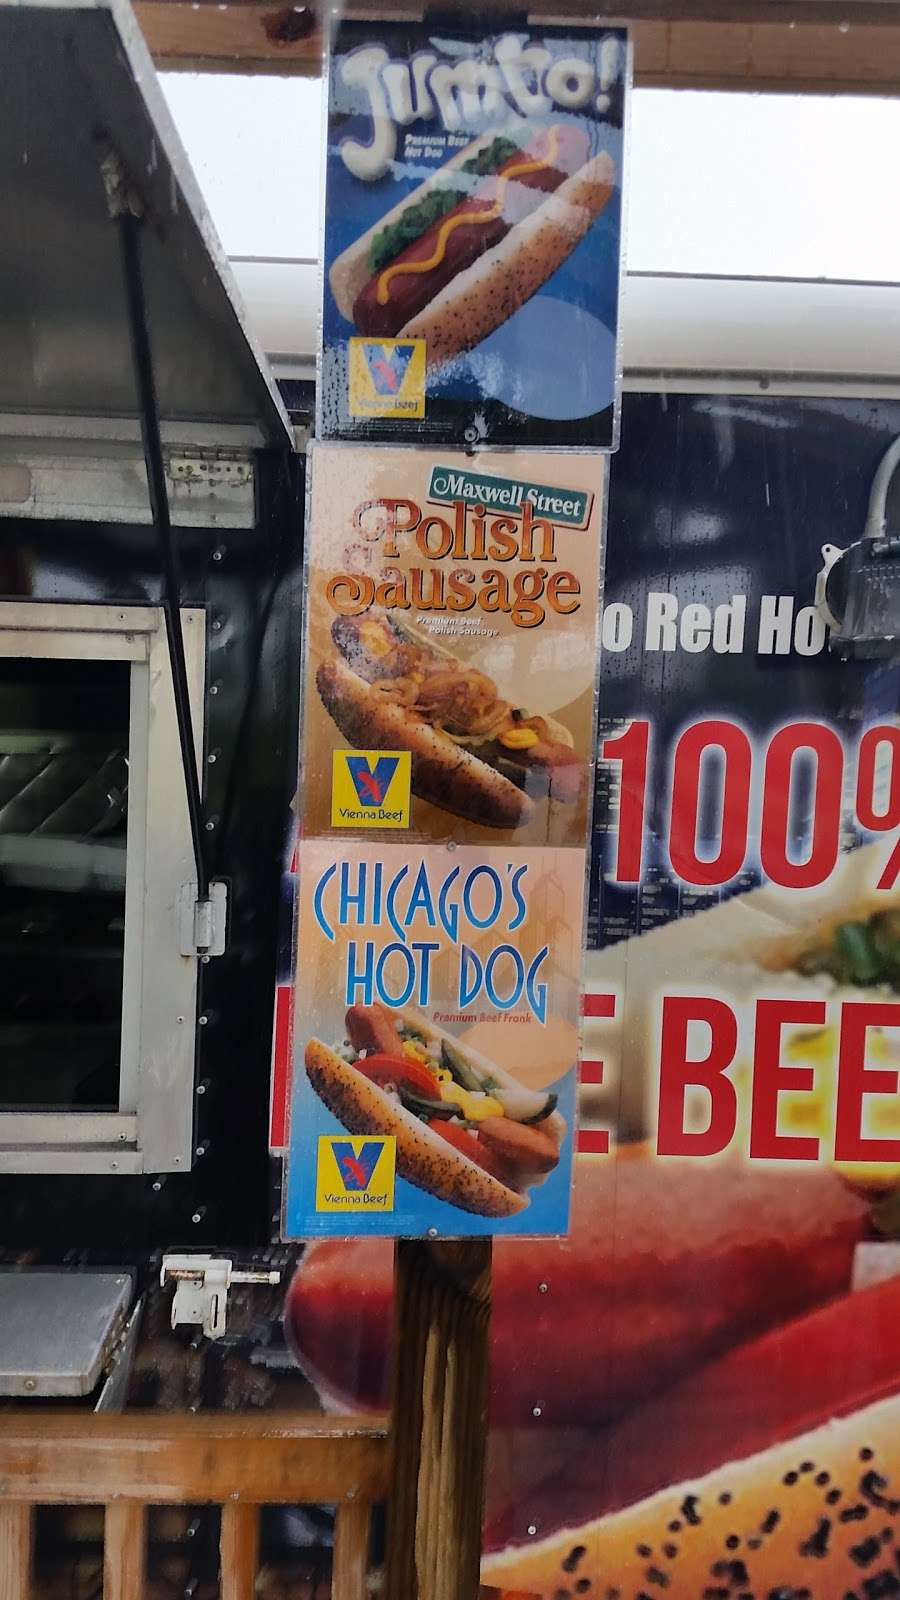 Marwan- VIENNA HOT DOGS - restaurant  | Photo 3 of 6 | Address: 8740 FM 1960, Humble, TX 77346, USA | Phone: (678) 949-4449